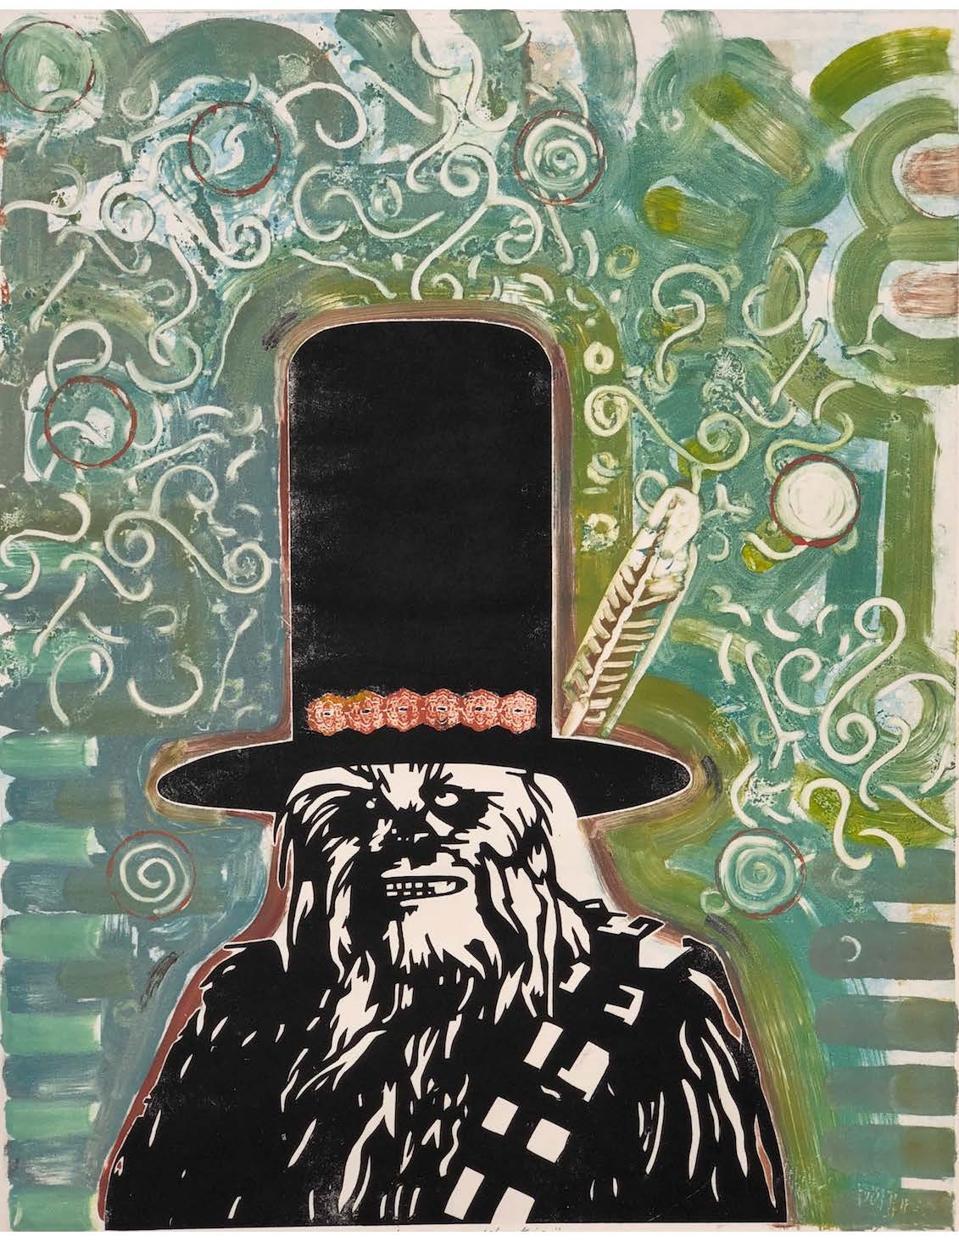 Randy Kemp (Choctaw/Muscogee-Creek/Euchee), Western Wookie of Klagetoh, 2018. Monotype original, hand cut stencils and brush marks on BFK Rives paper.